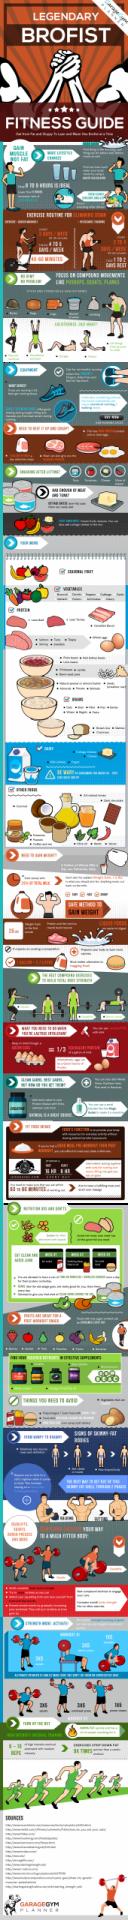 GarageGym_Infographic